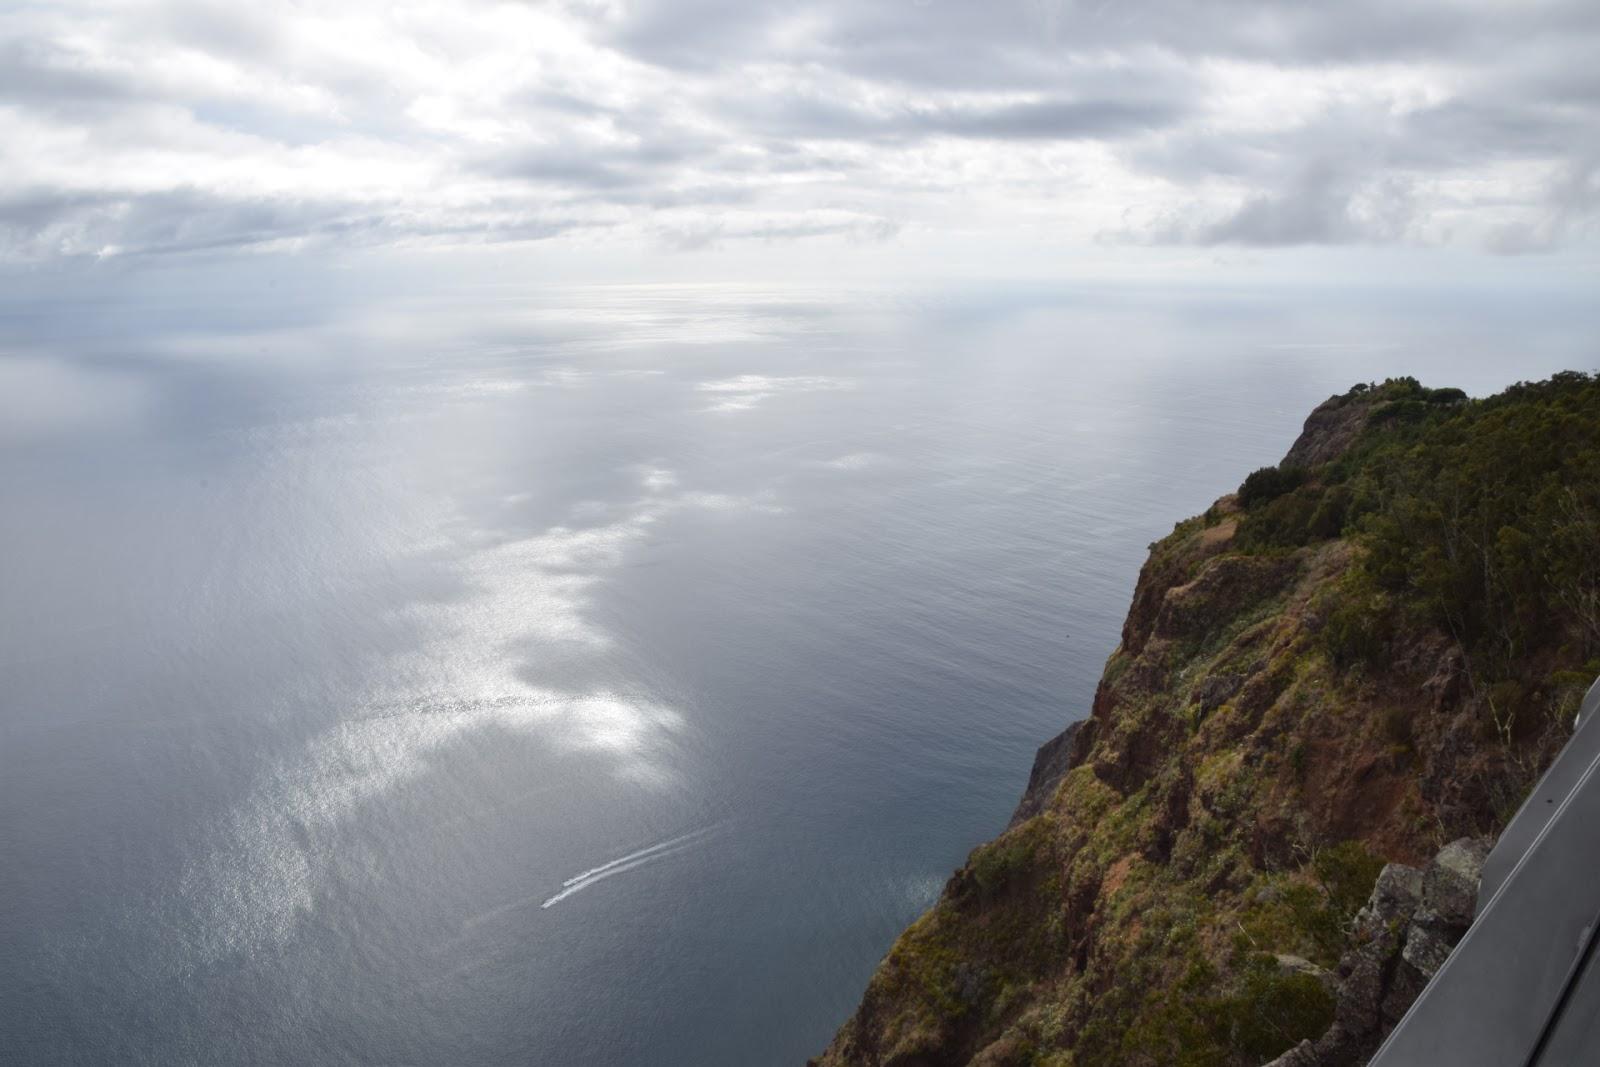 "(<img alt=""Madeira viewing platform"">)"